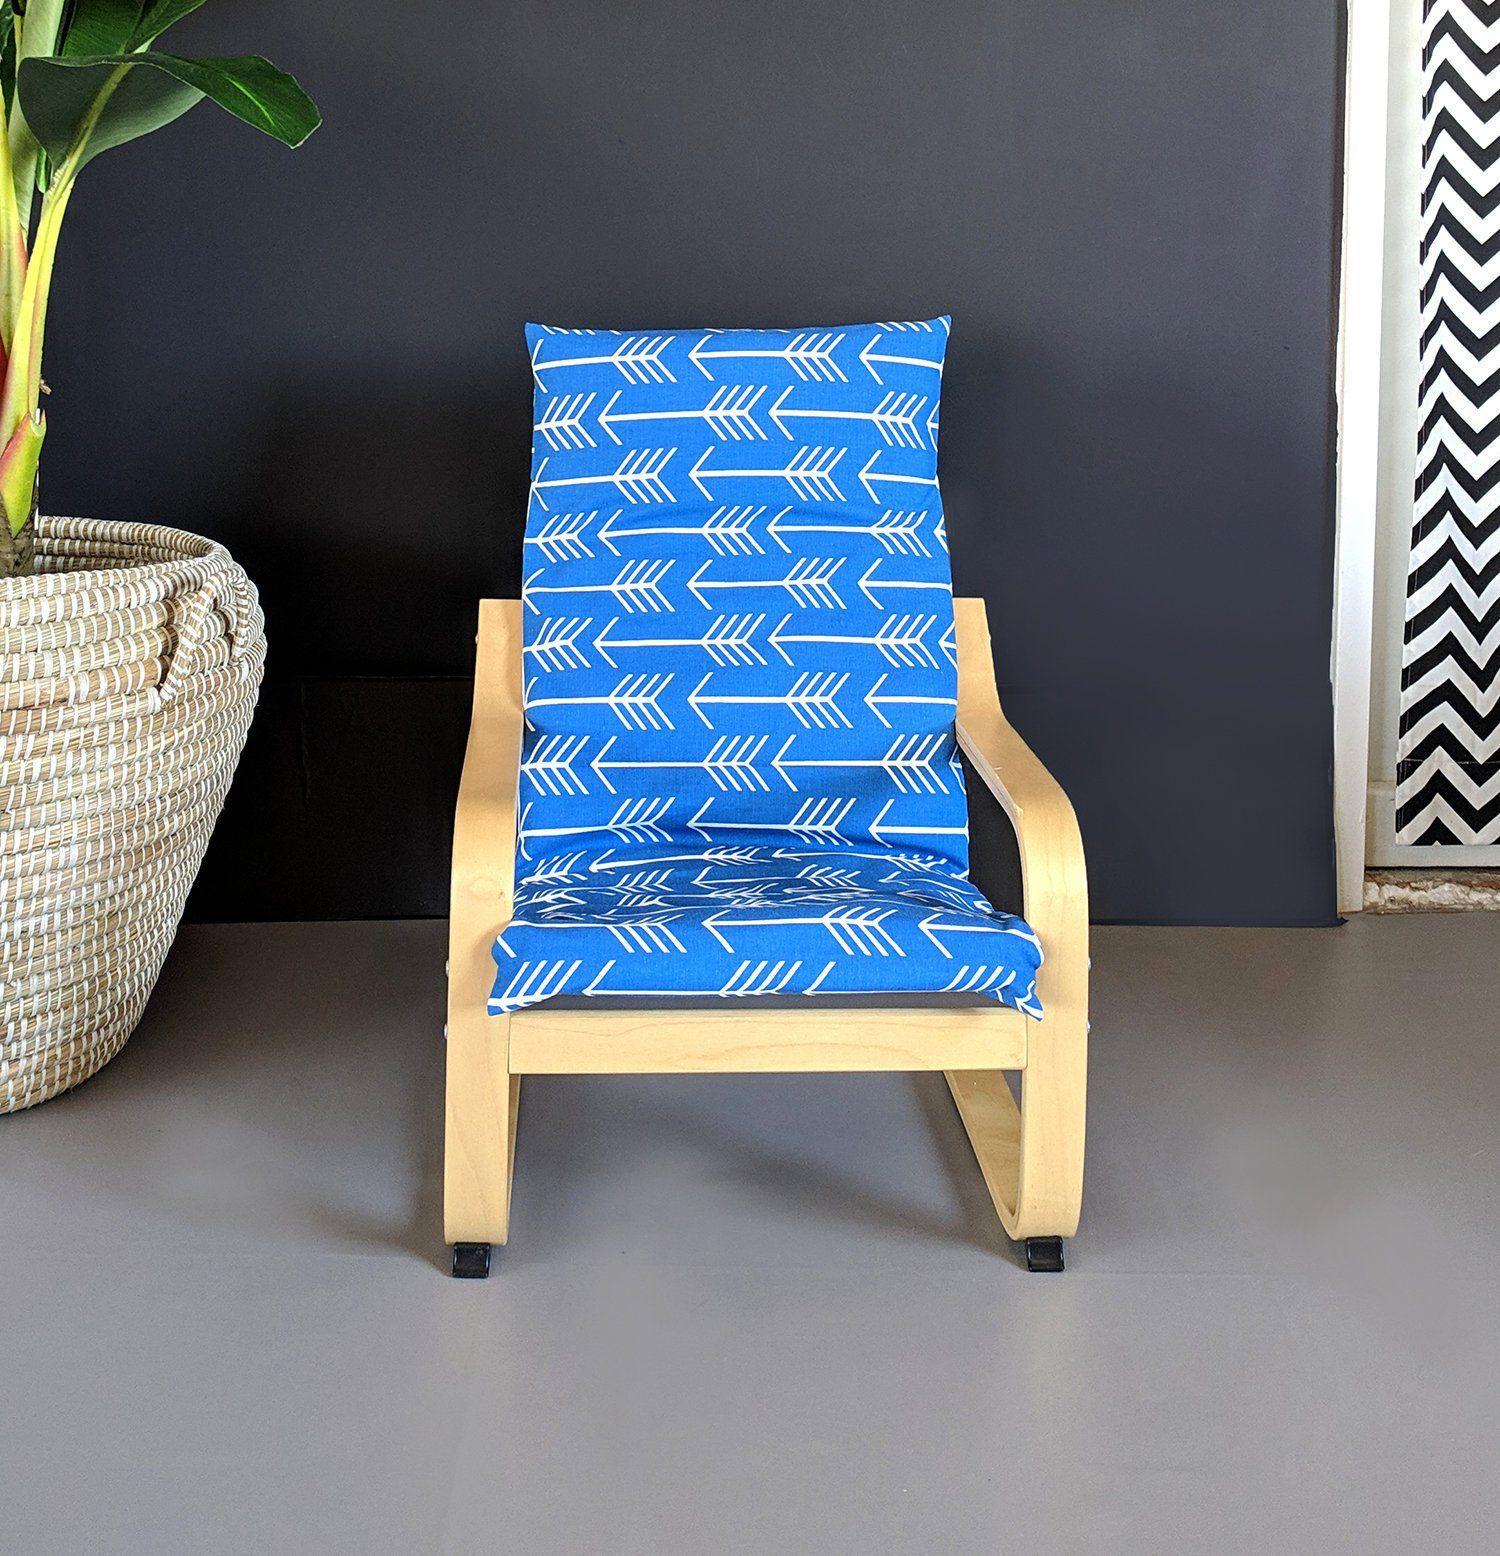 Bright Blue Arrow Print IKEA KIDS POÄNG Seat Cover